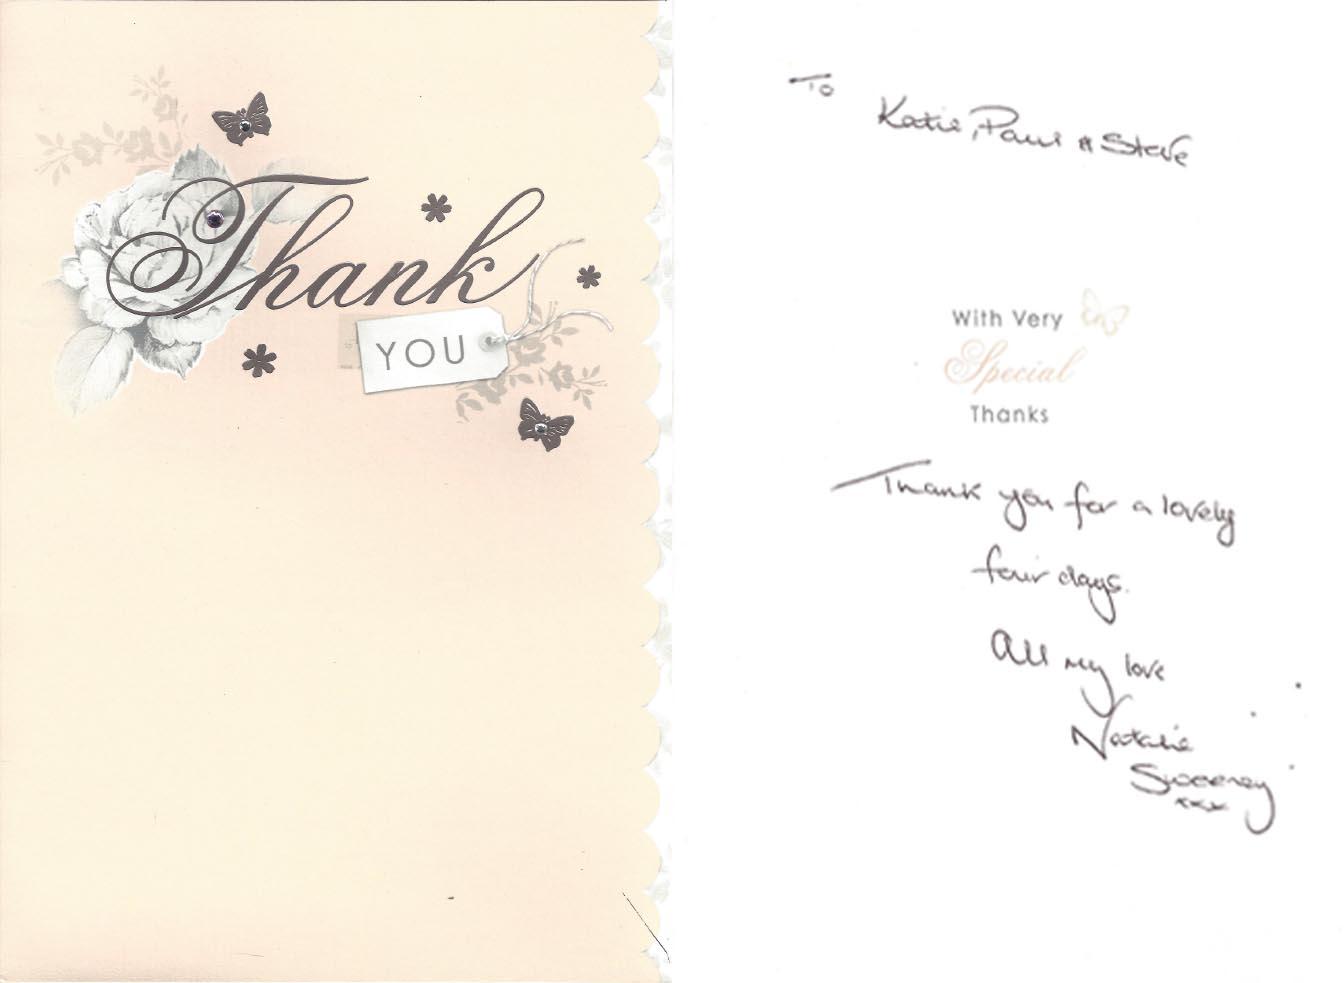 Permanent Makeup Training Academy Katy Jobbins Student Thank You Card Messages